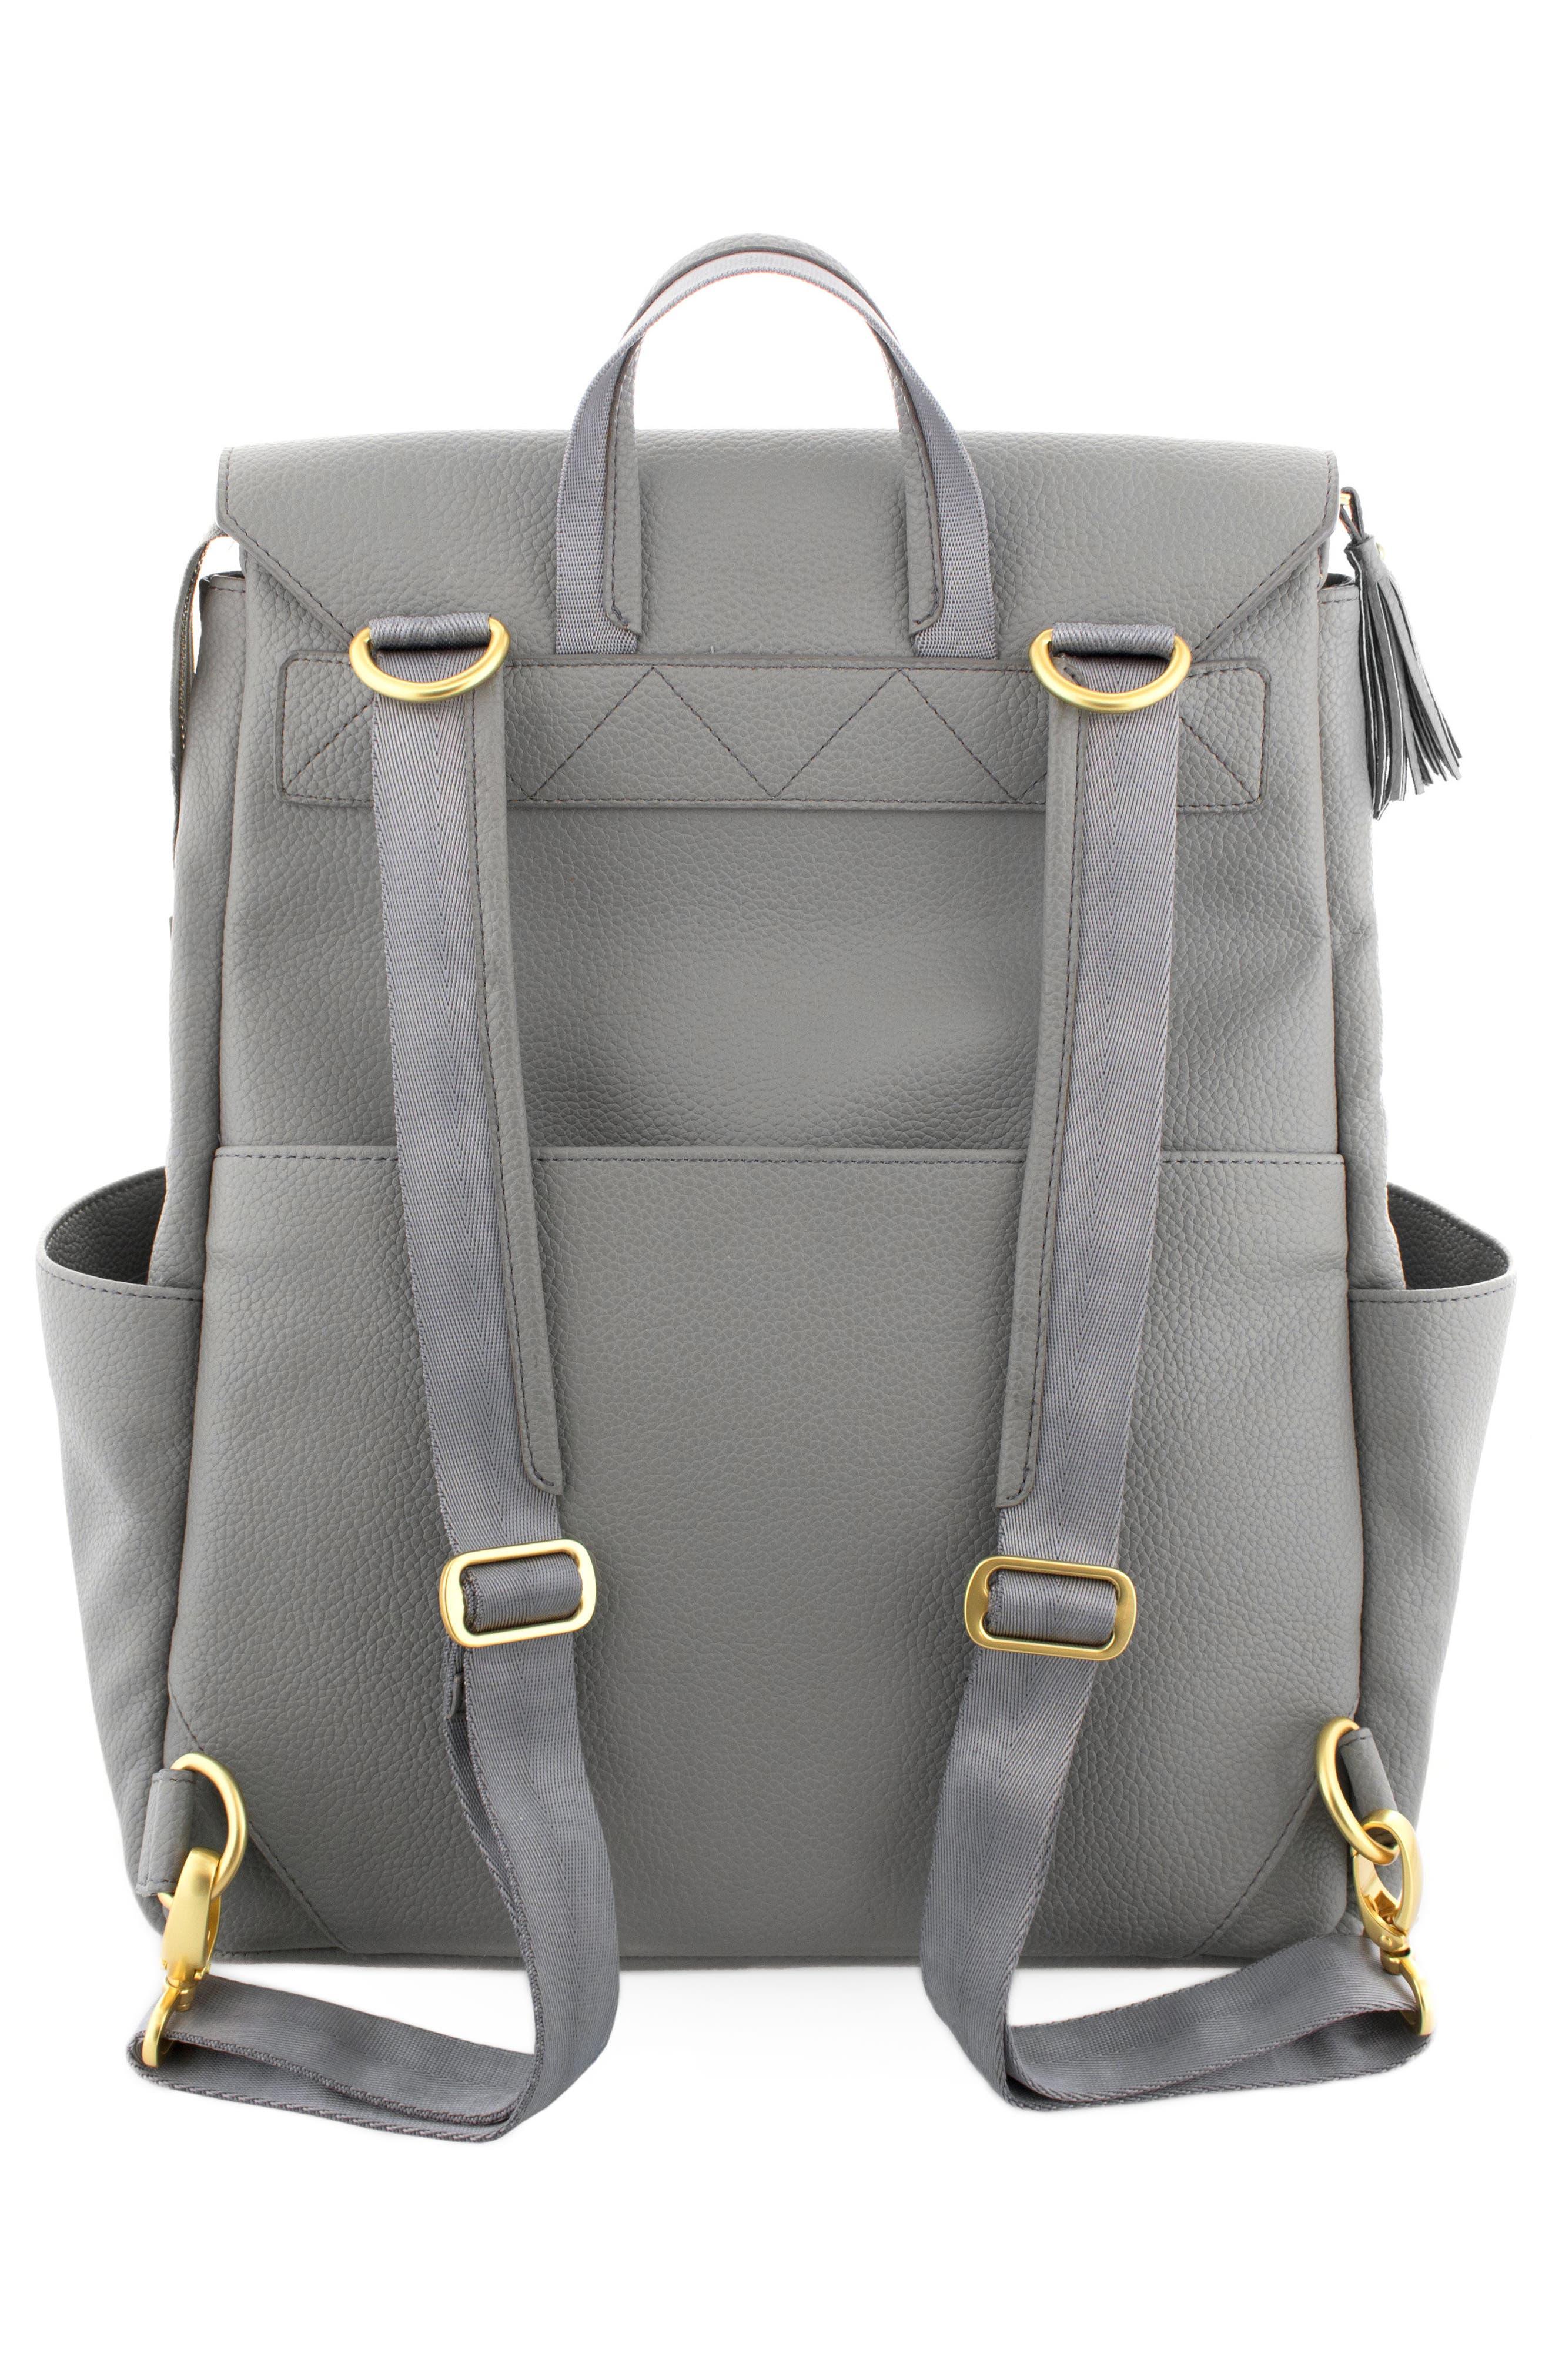 Convertible Diaper Backpack,                             Alternate thumbnail 8, color,